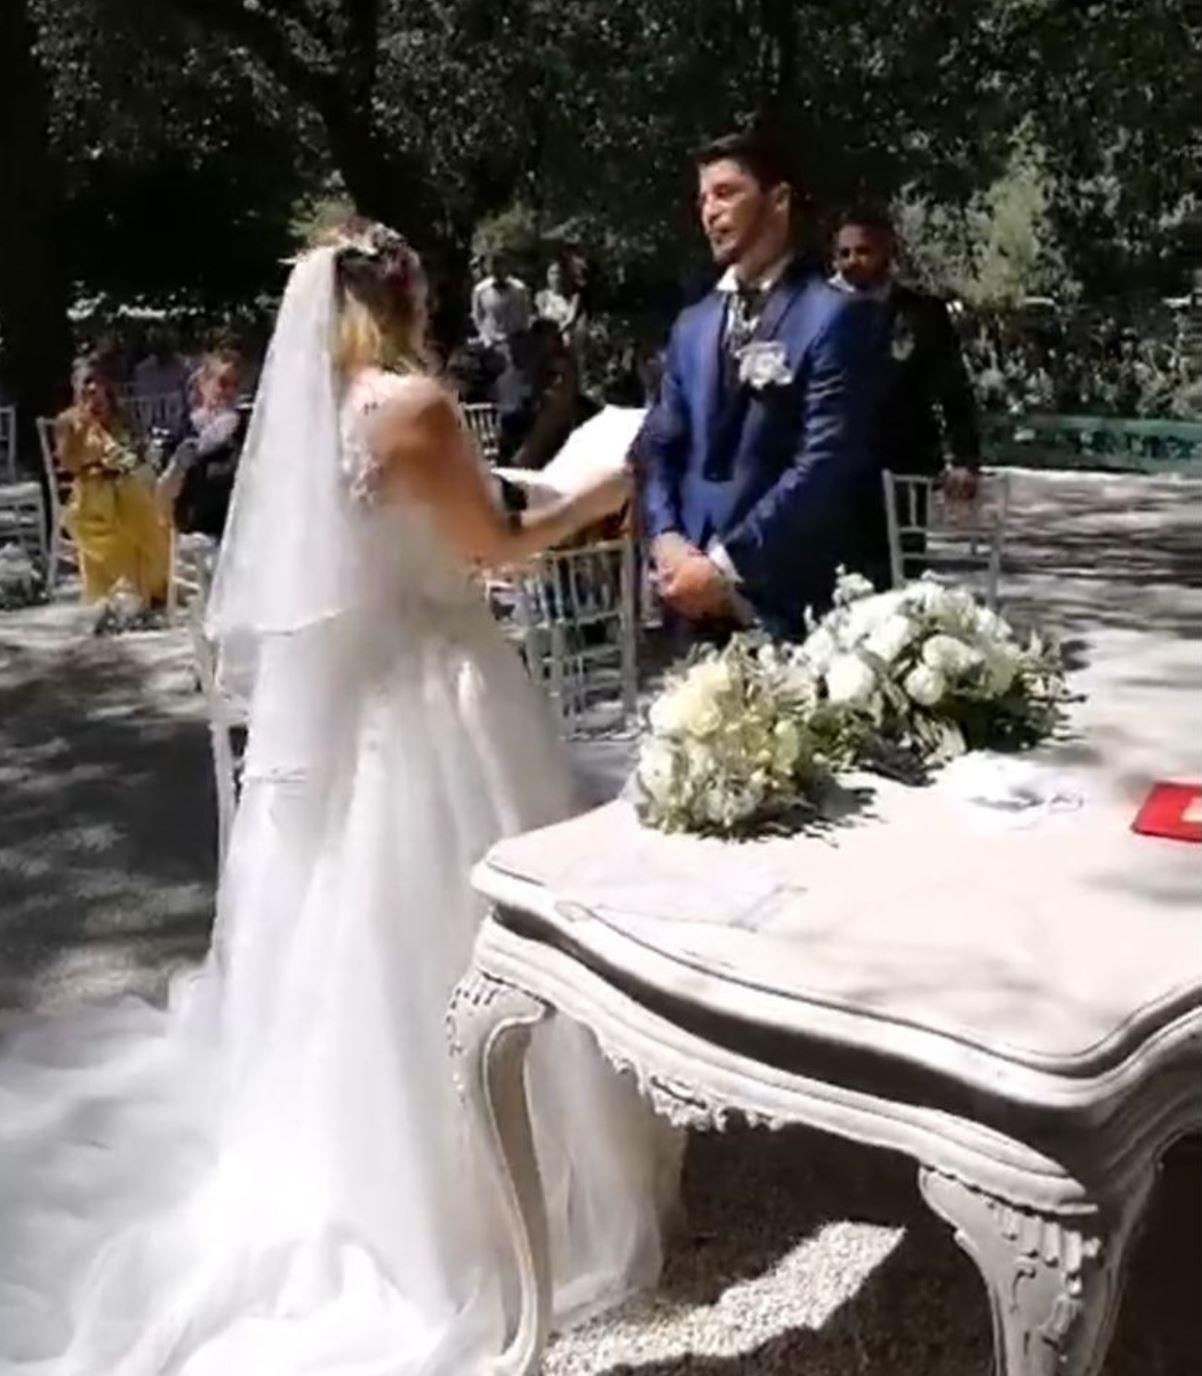 claudia stefano temptation island si sposano